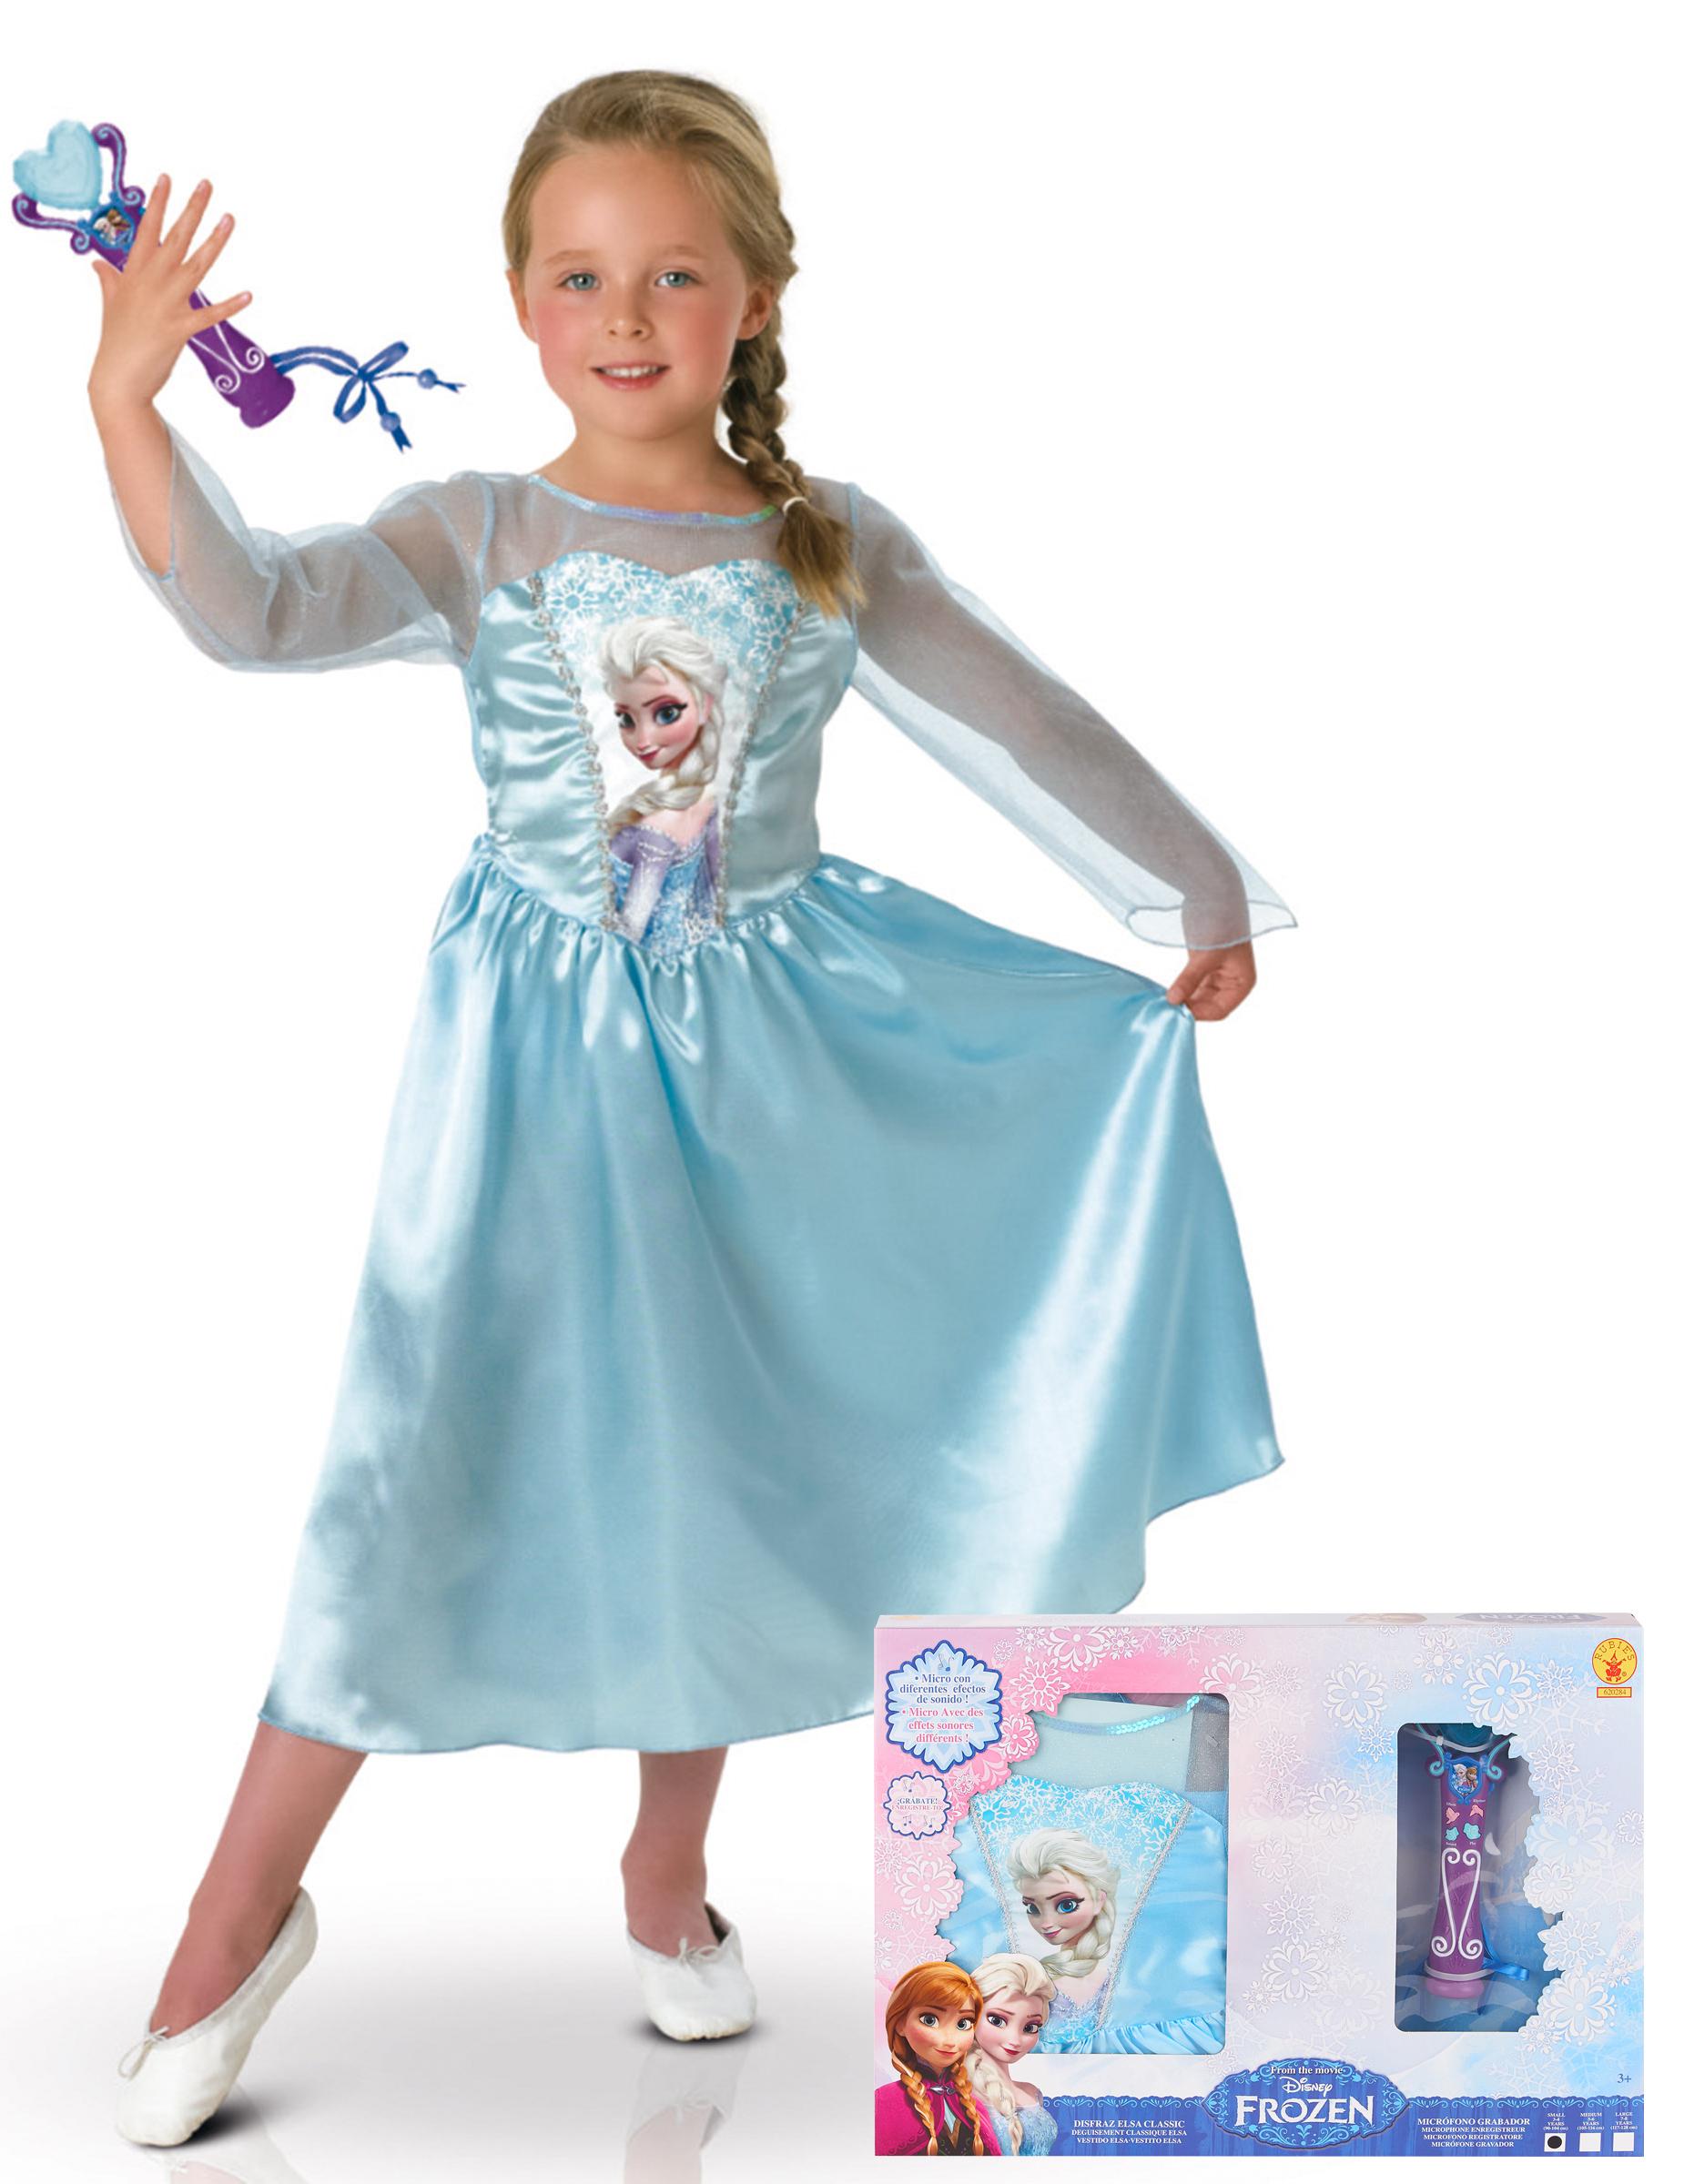 Klassisk Elsa Frozen™ - utklädnad + mikrofon 1eb23721ae77d